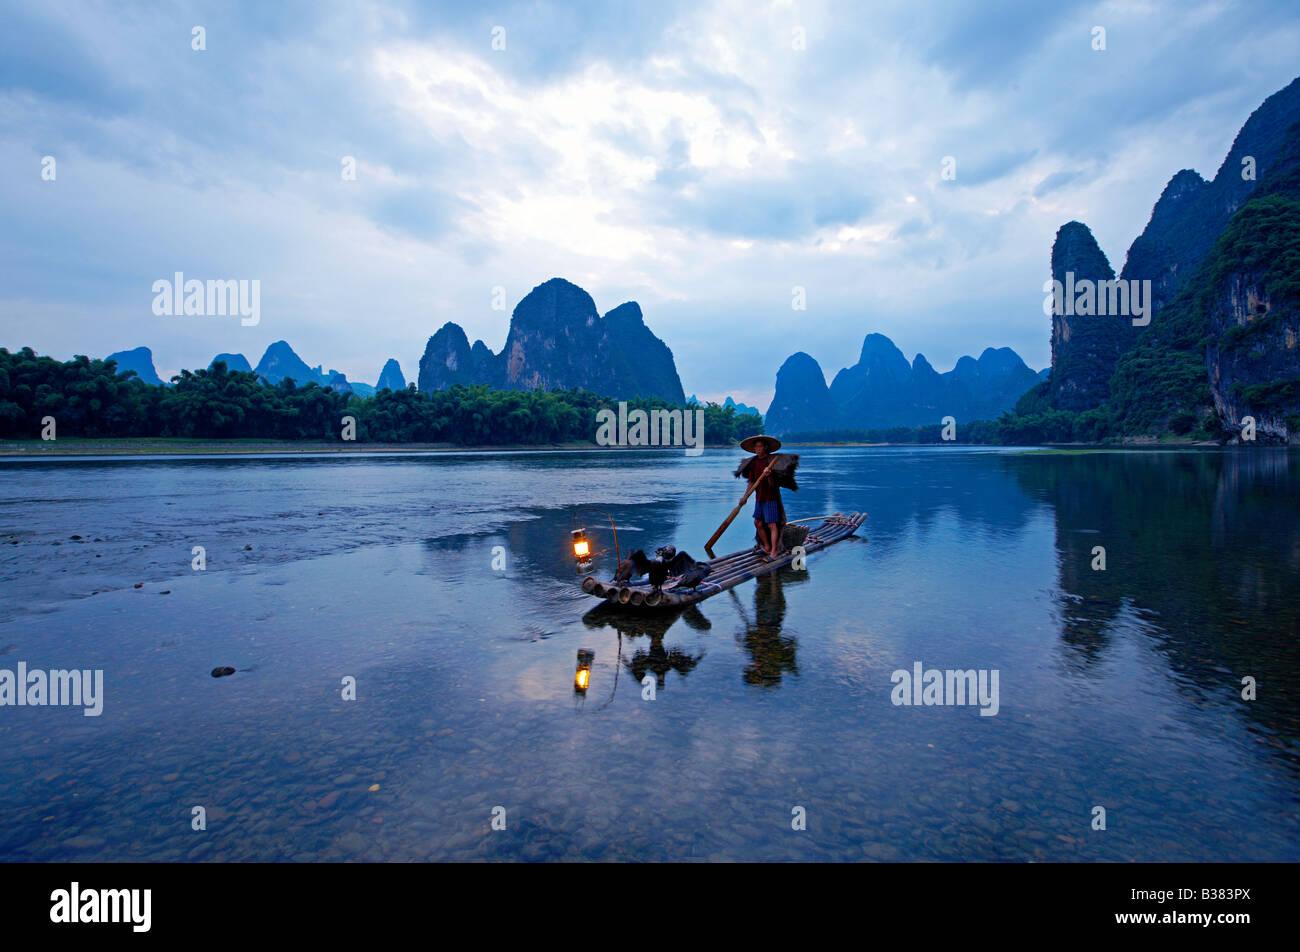 Kormoran Fischer in Lijang Li Fluss Xingping Guilin Provinz China Model release 701 Stockbild